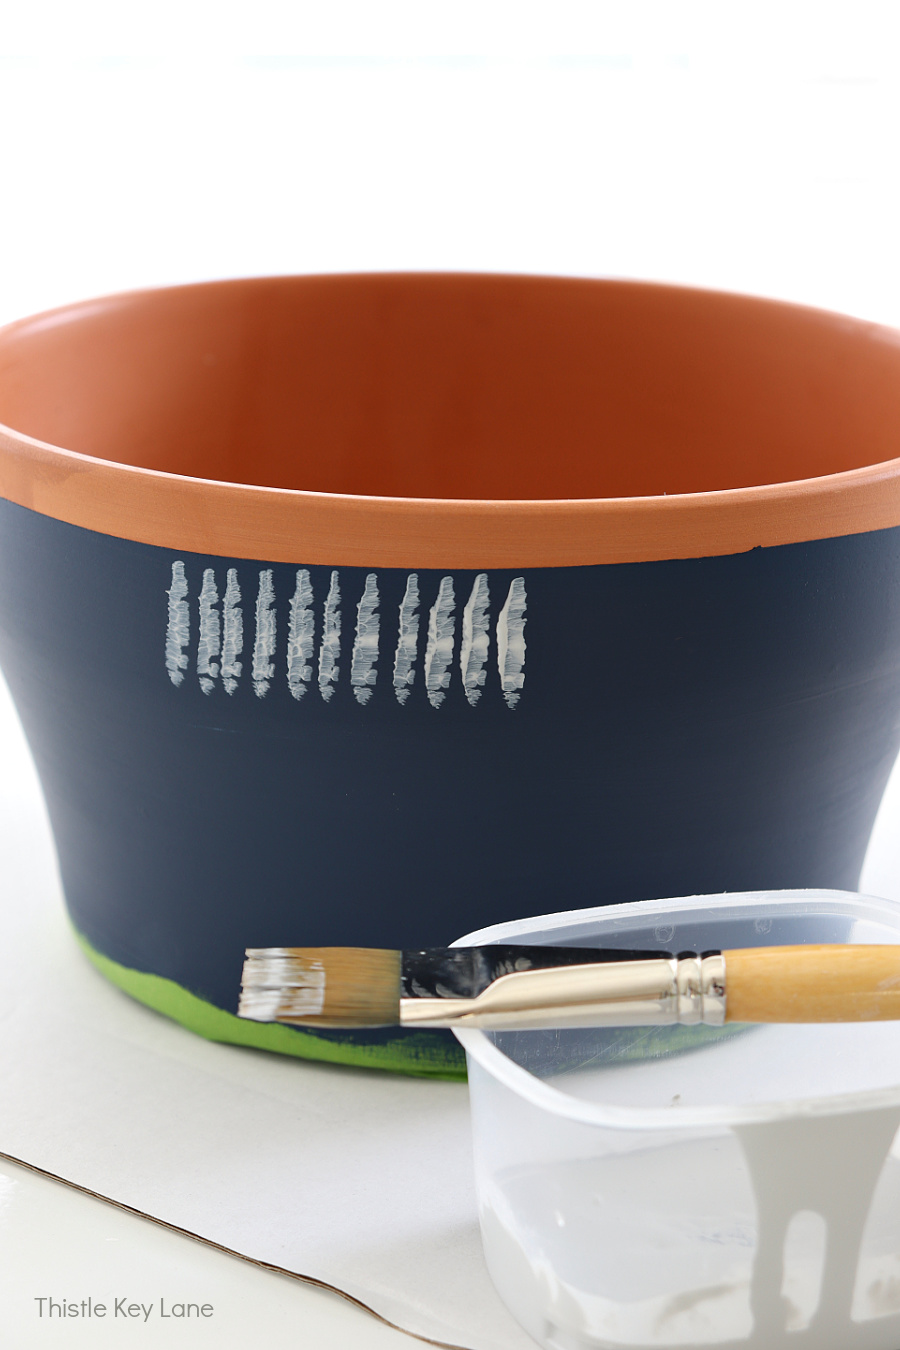 Technique used to paint terracotta pot.